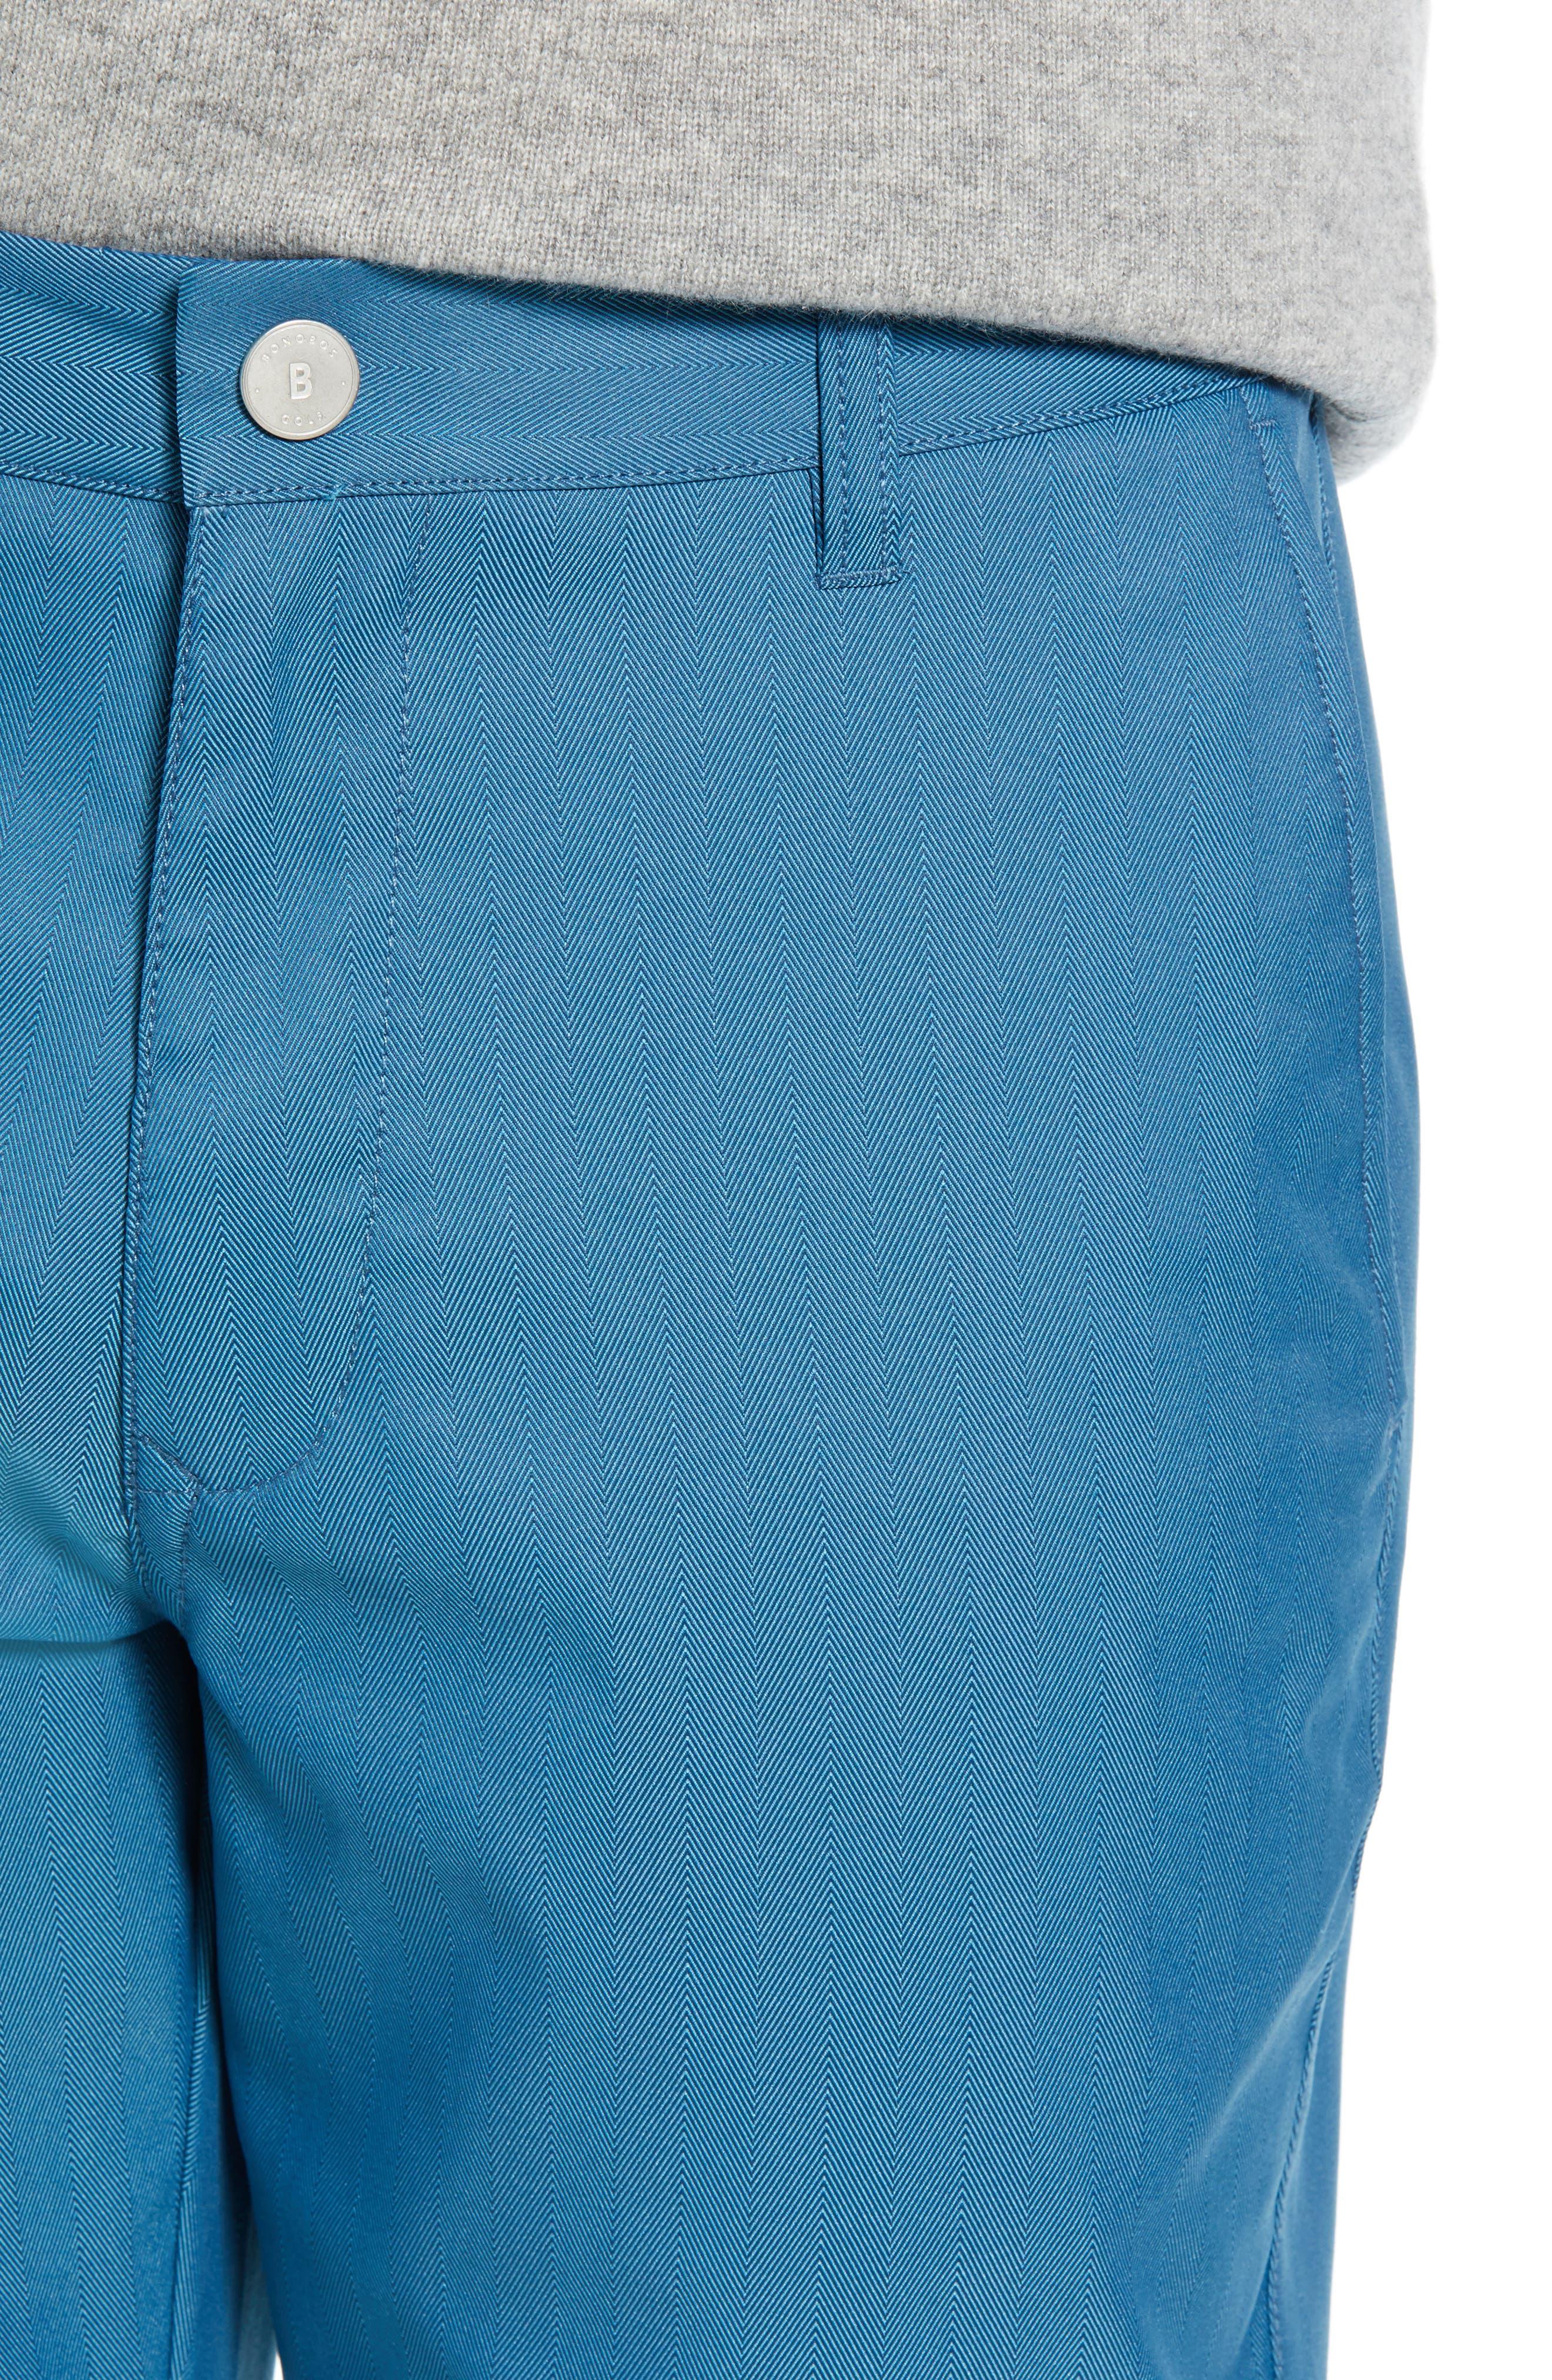 Highland Slim Fit Golf Pants,                             Alternate thumbnail 4, color,                             400